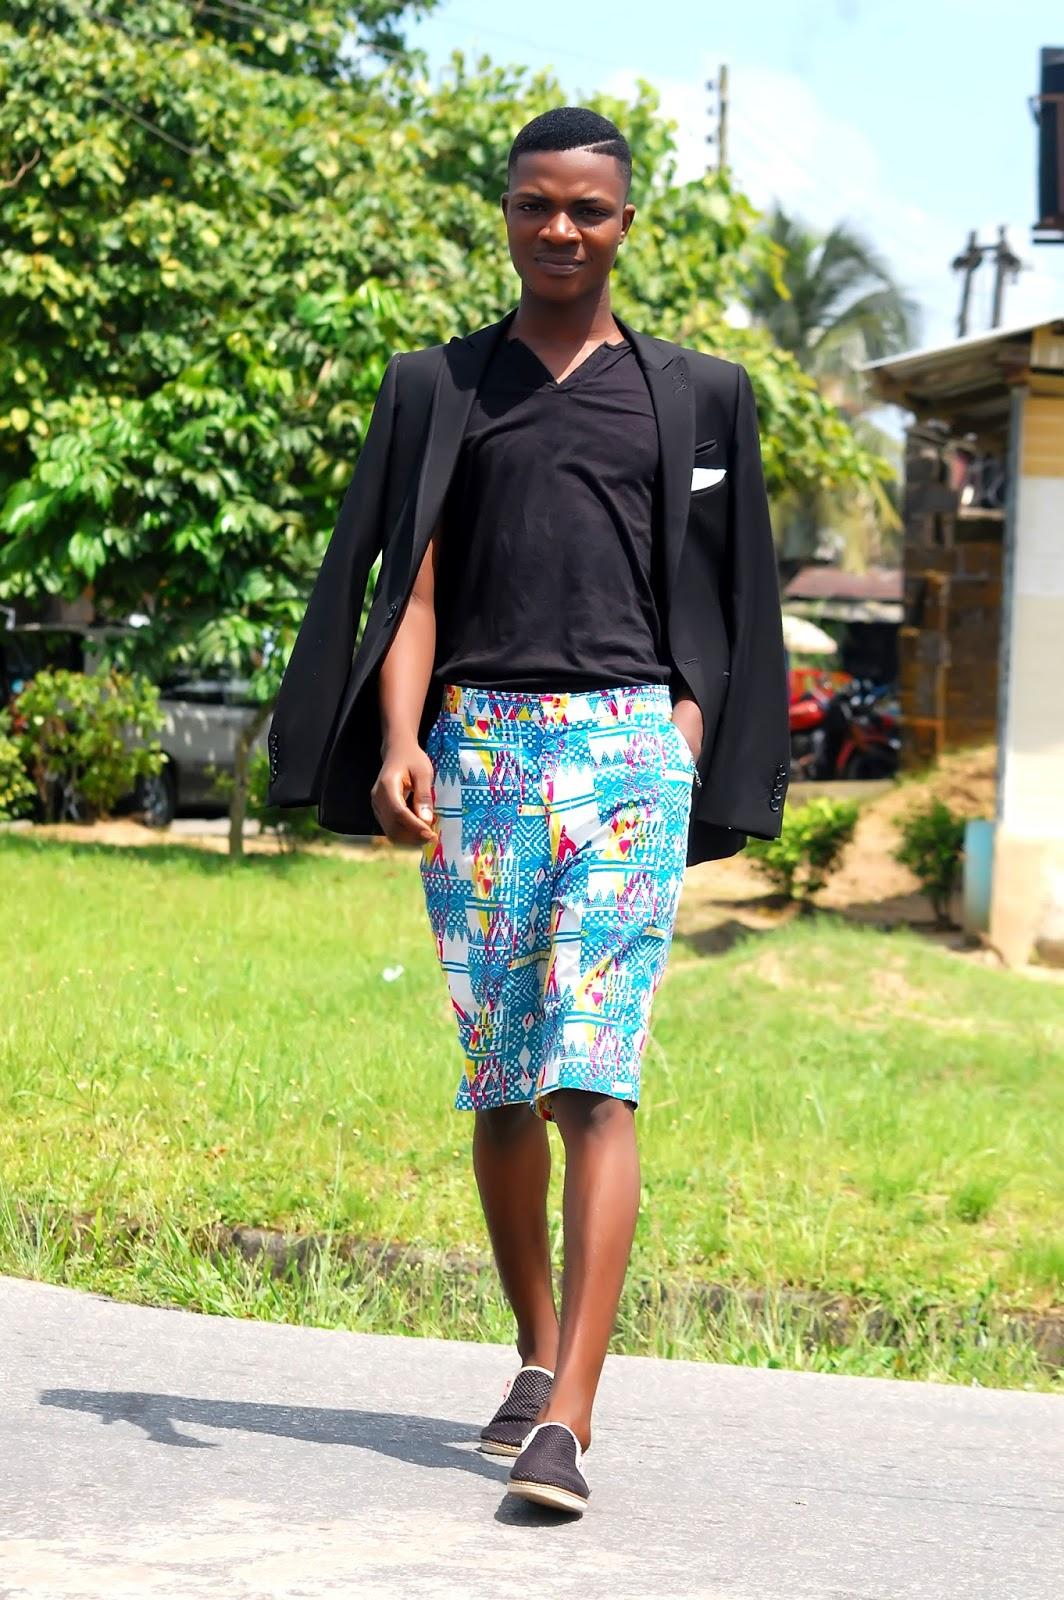 Ankara beach shorts for men